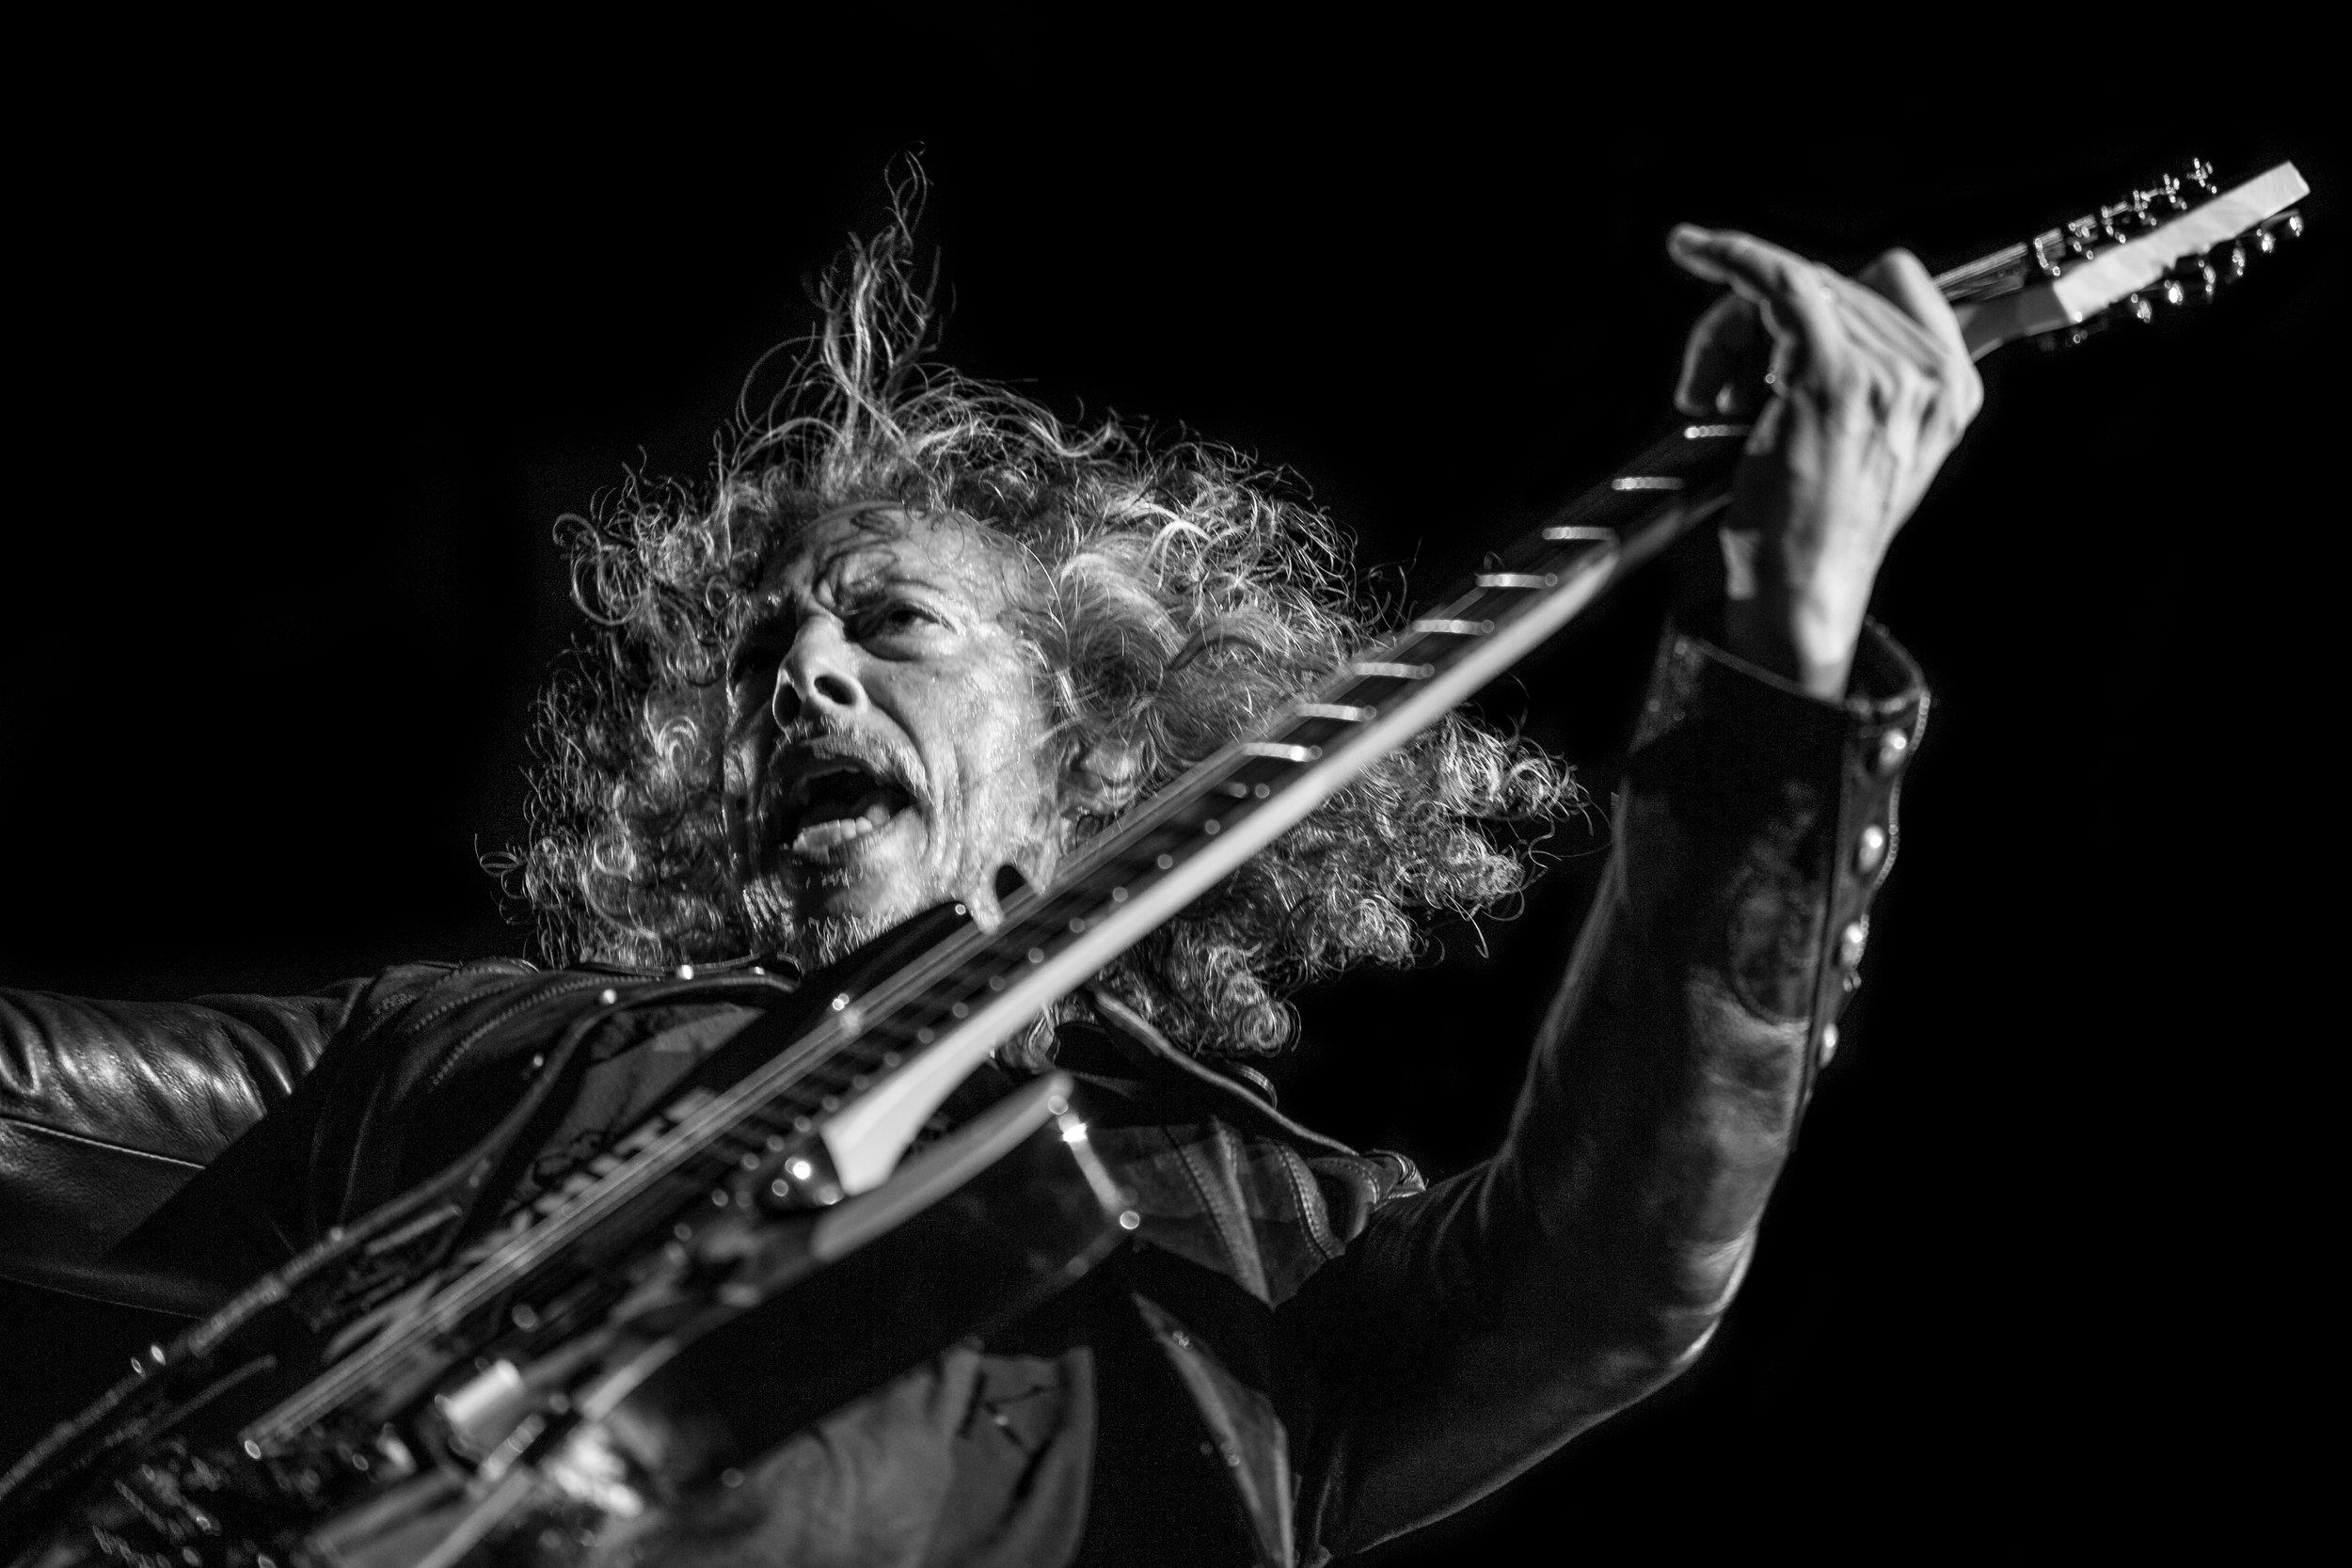 Kirk Hammett | Metallica